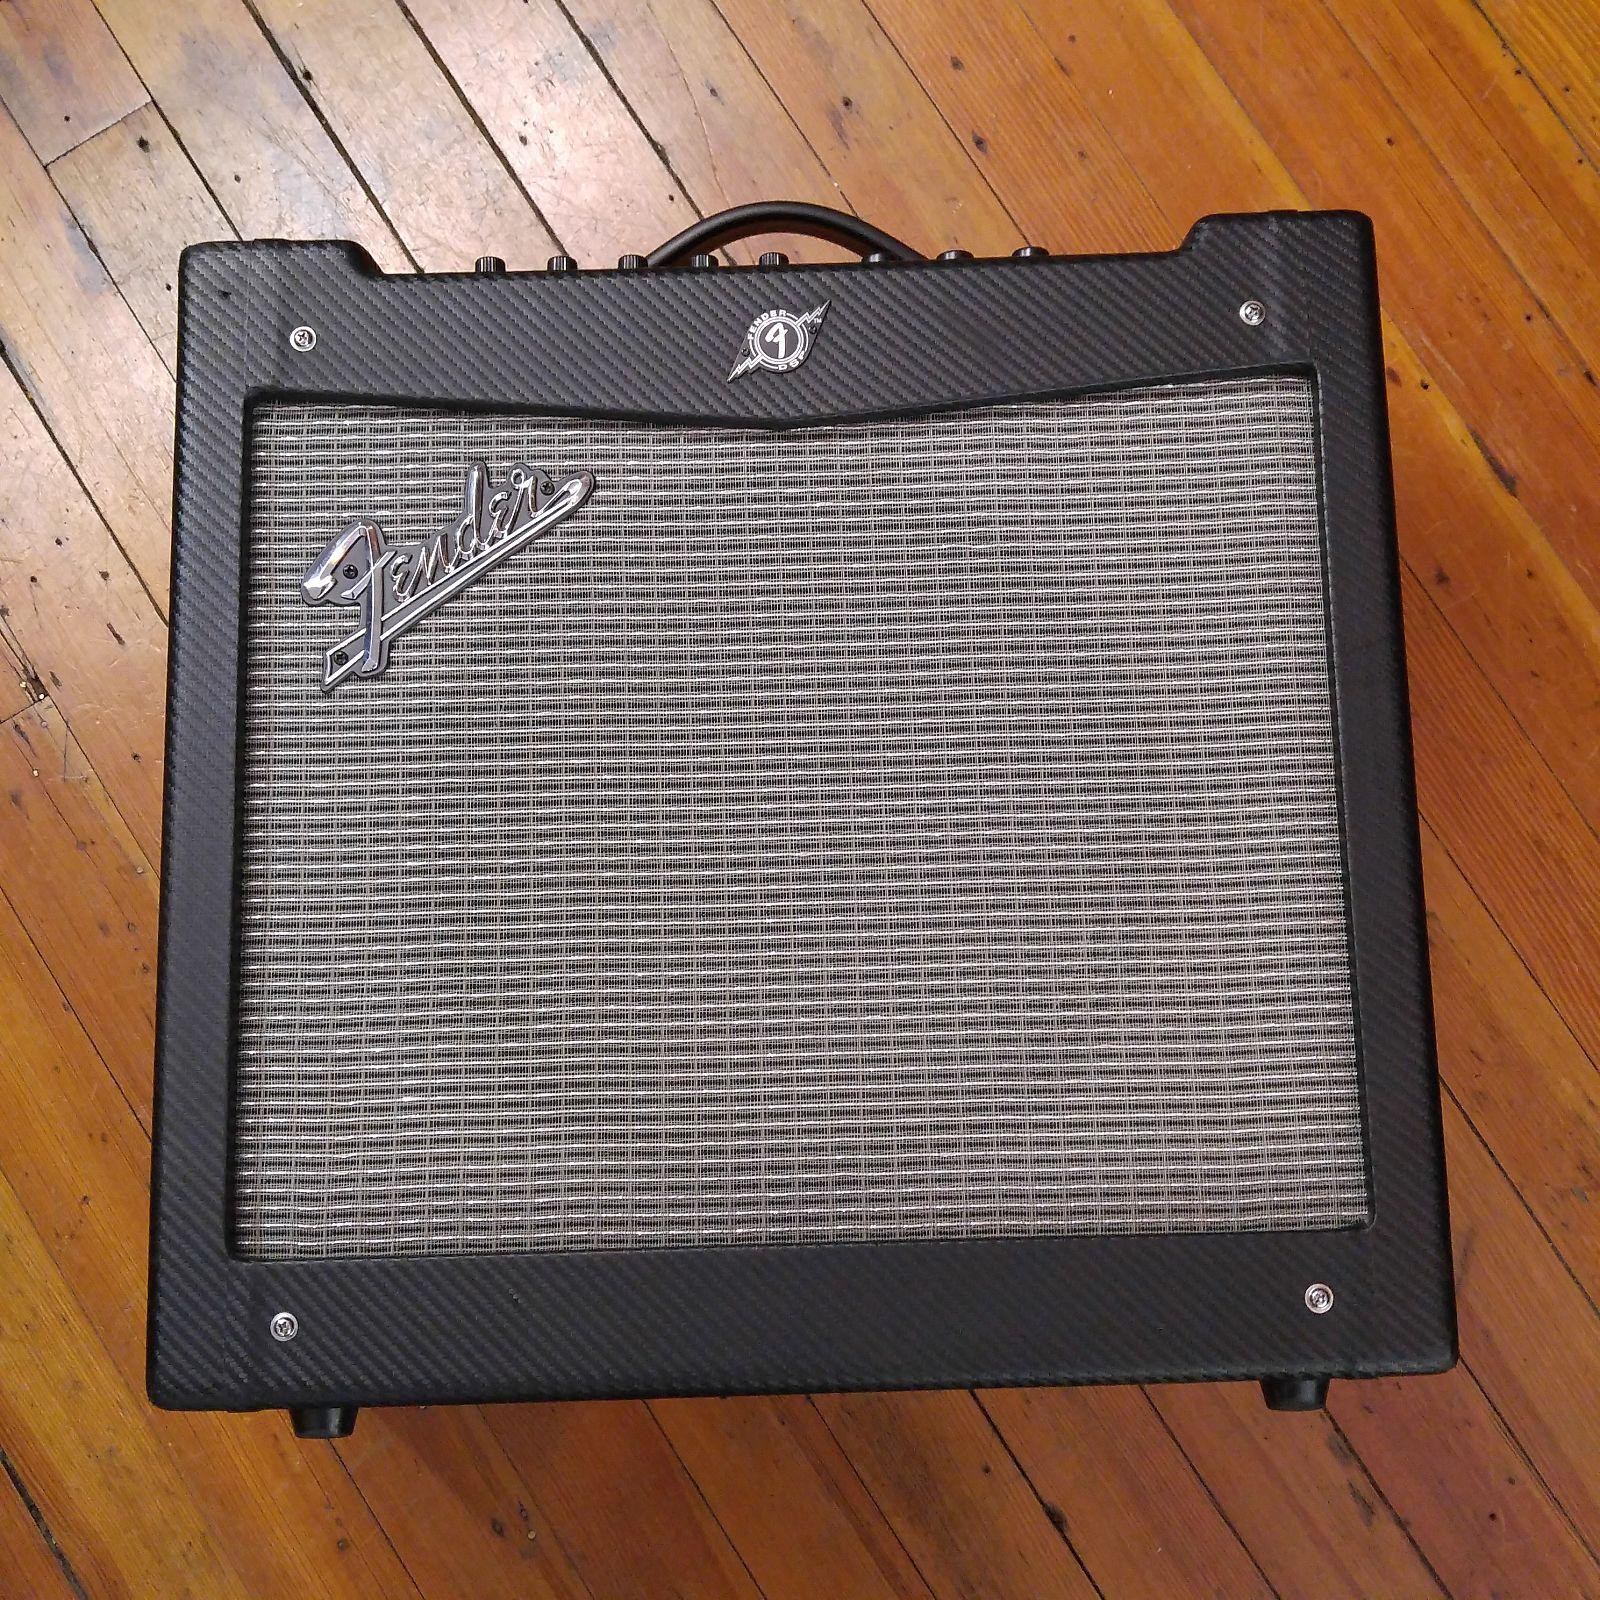 Fender Mustang II V1 40W 1x12 Guitar Combo Amp #CGPG10008786